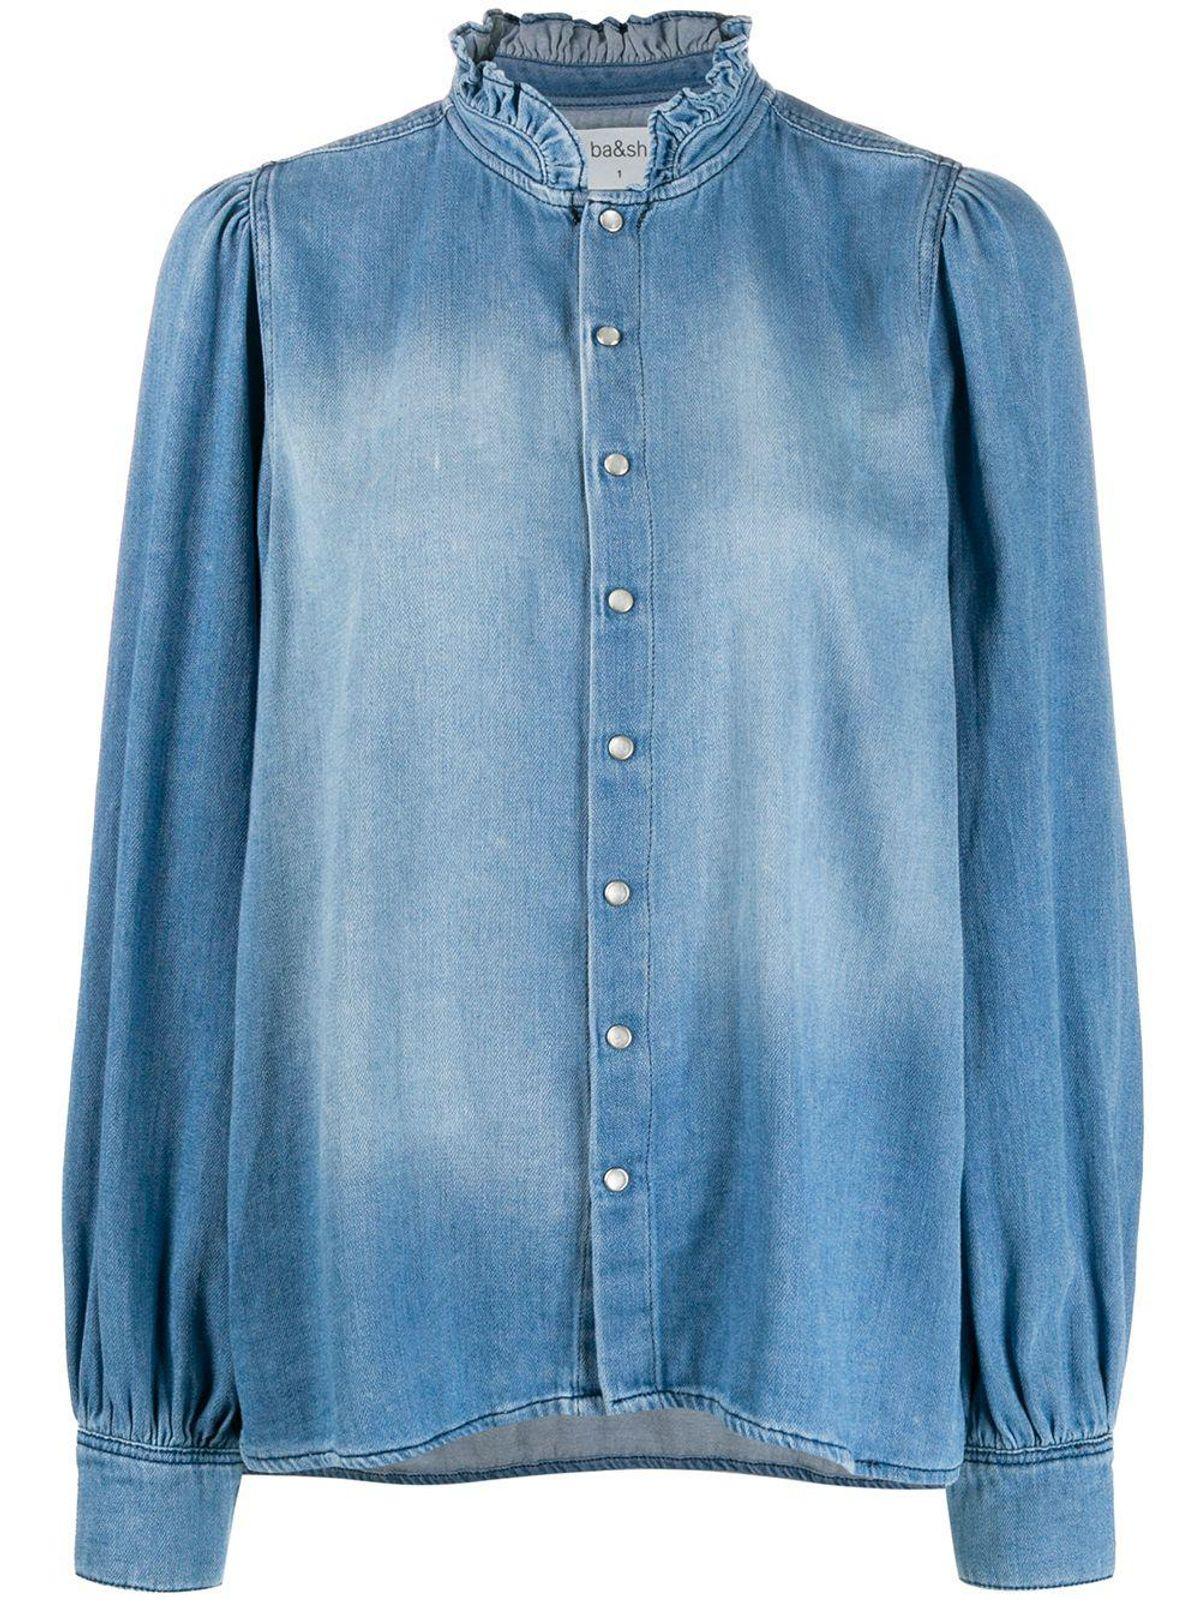 Axelle Denim Shirt